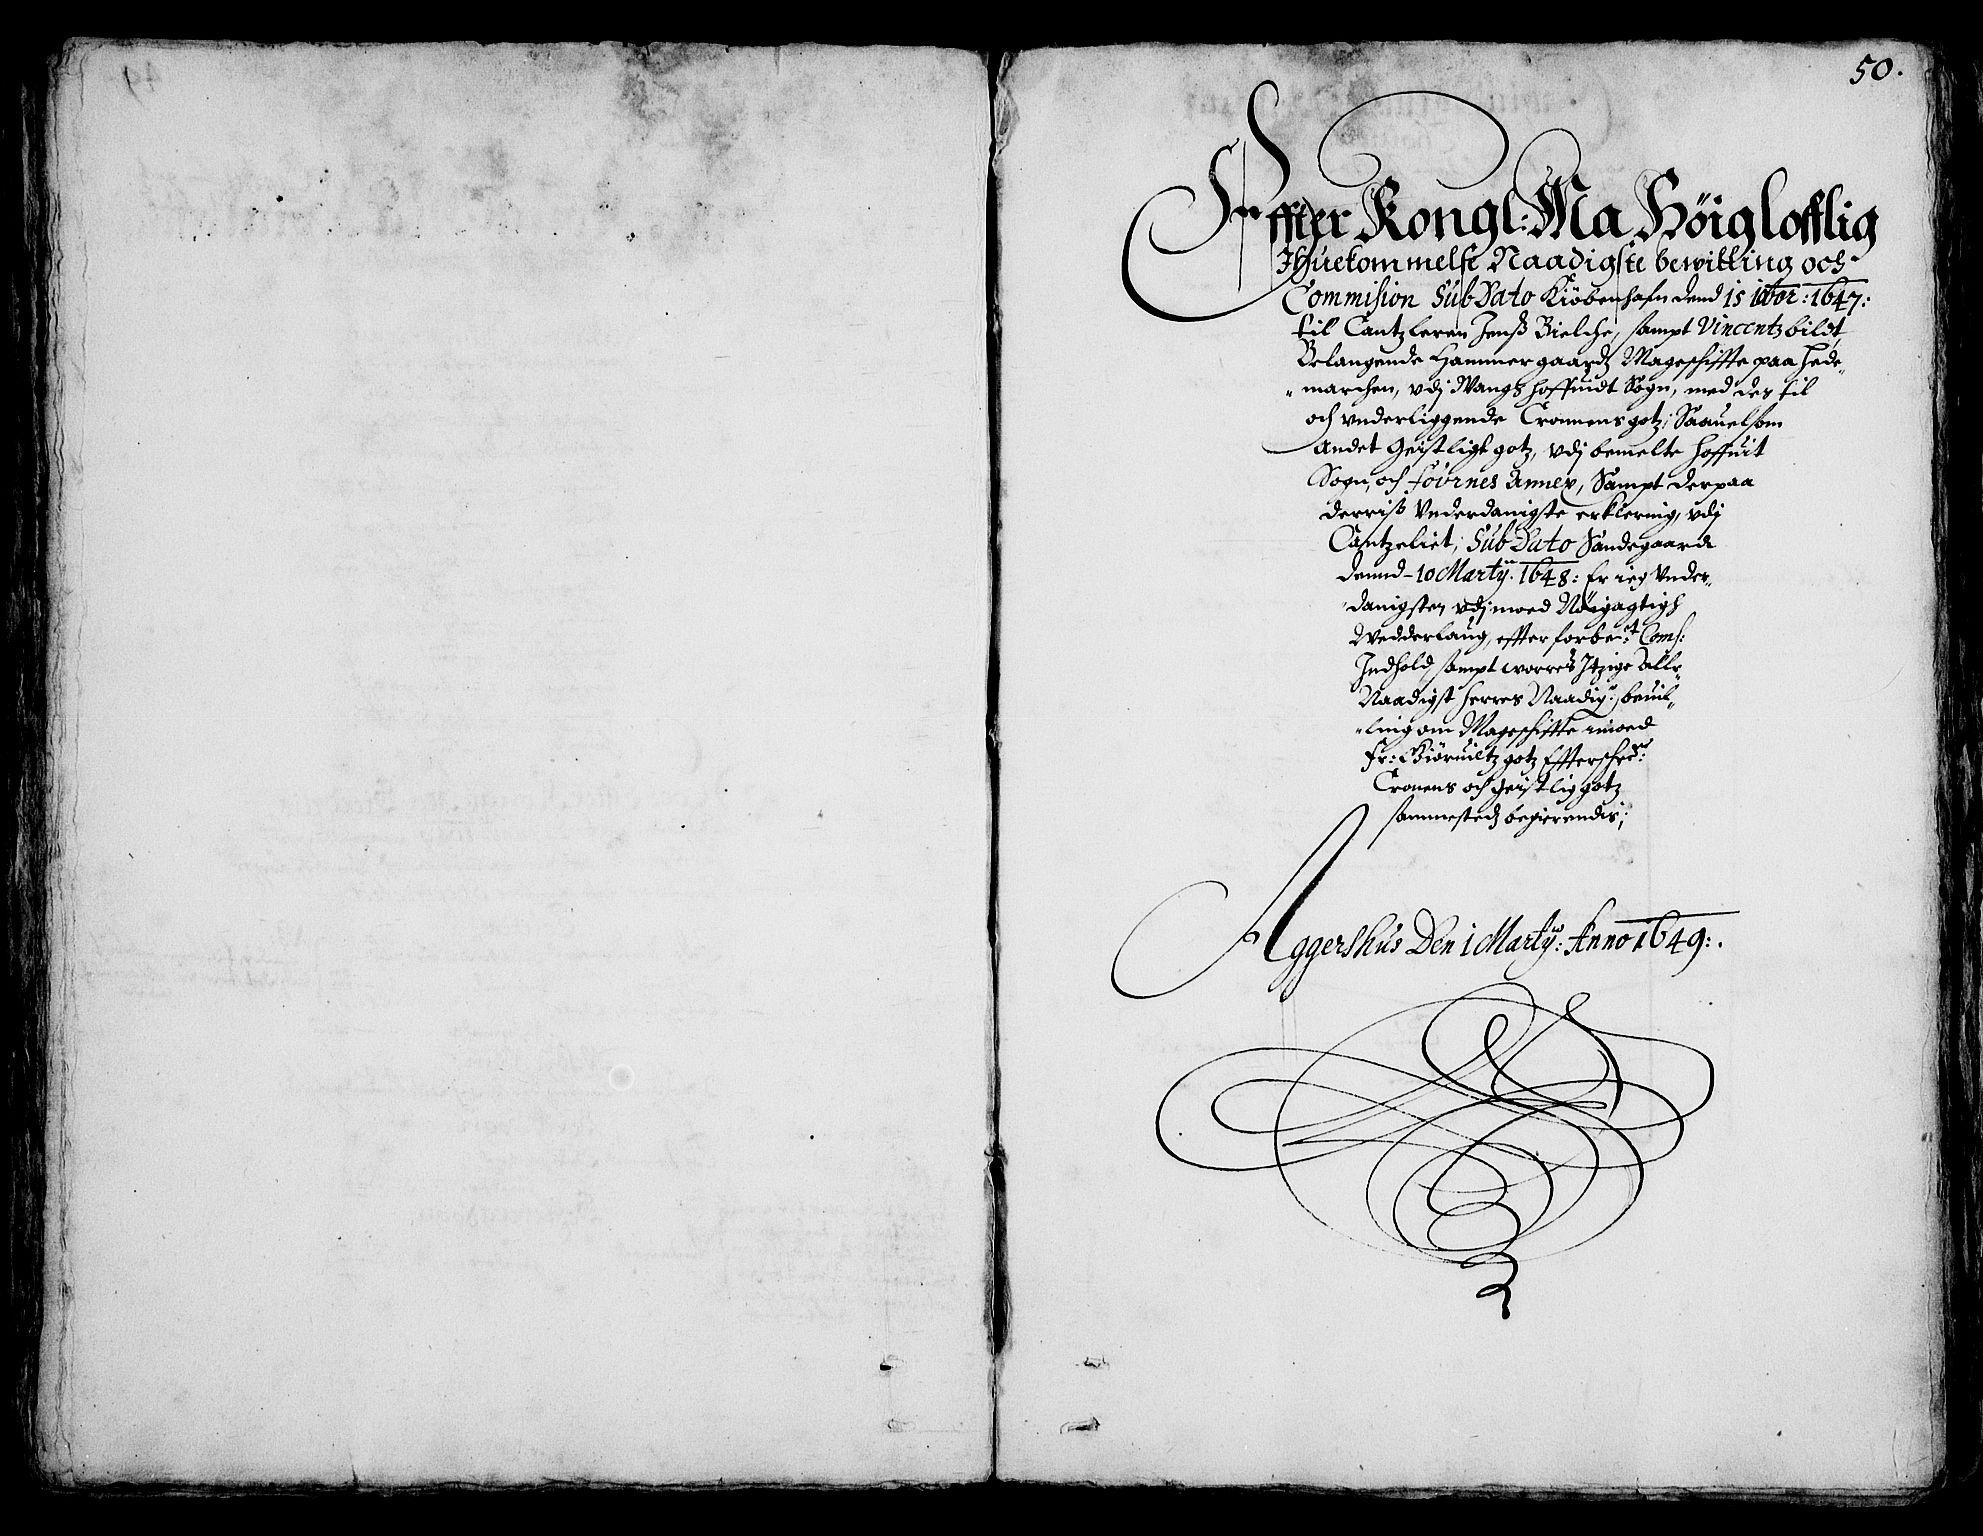 RA, Rentekammeret inntil 1814, Realistisk ordnet avdeling, On/L0001: Statens gods, 1651, s. 49b-50a